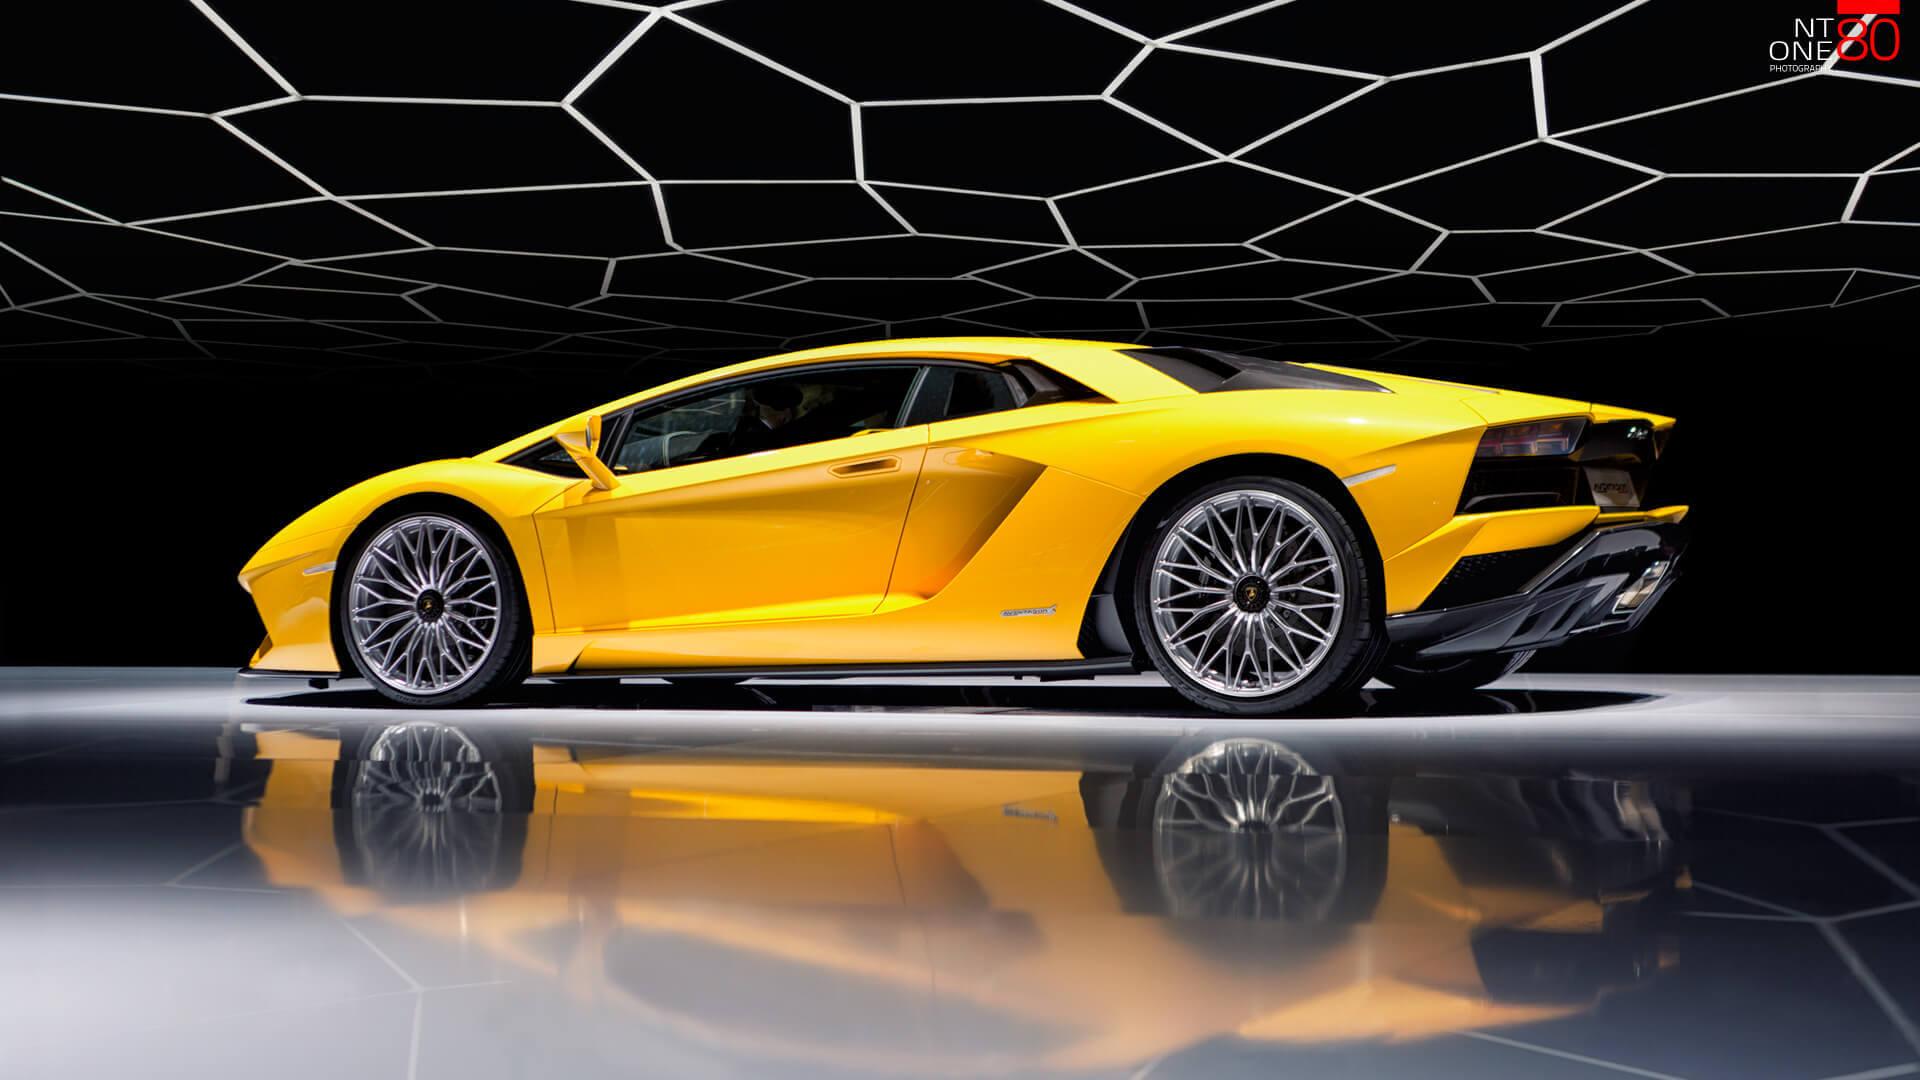 Lamborghini Aventador studio photography